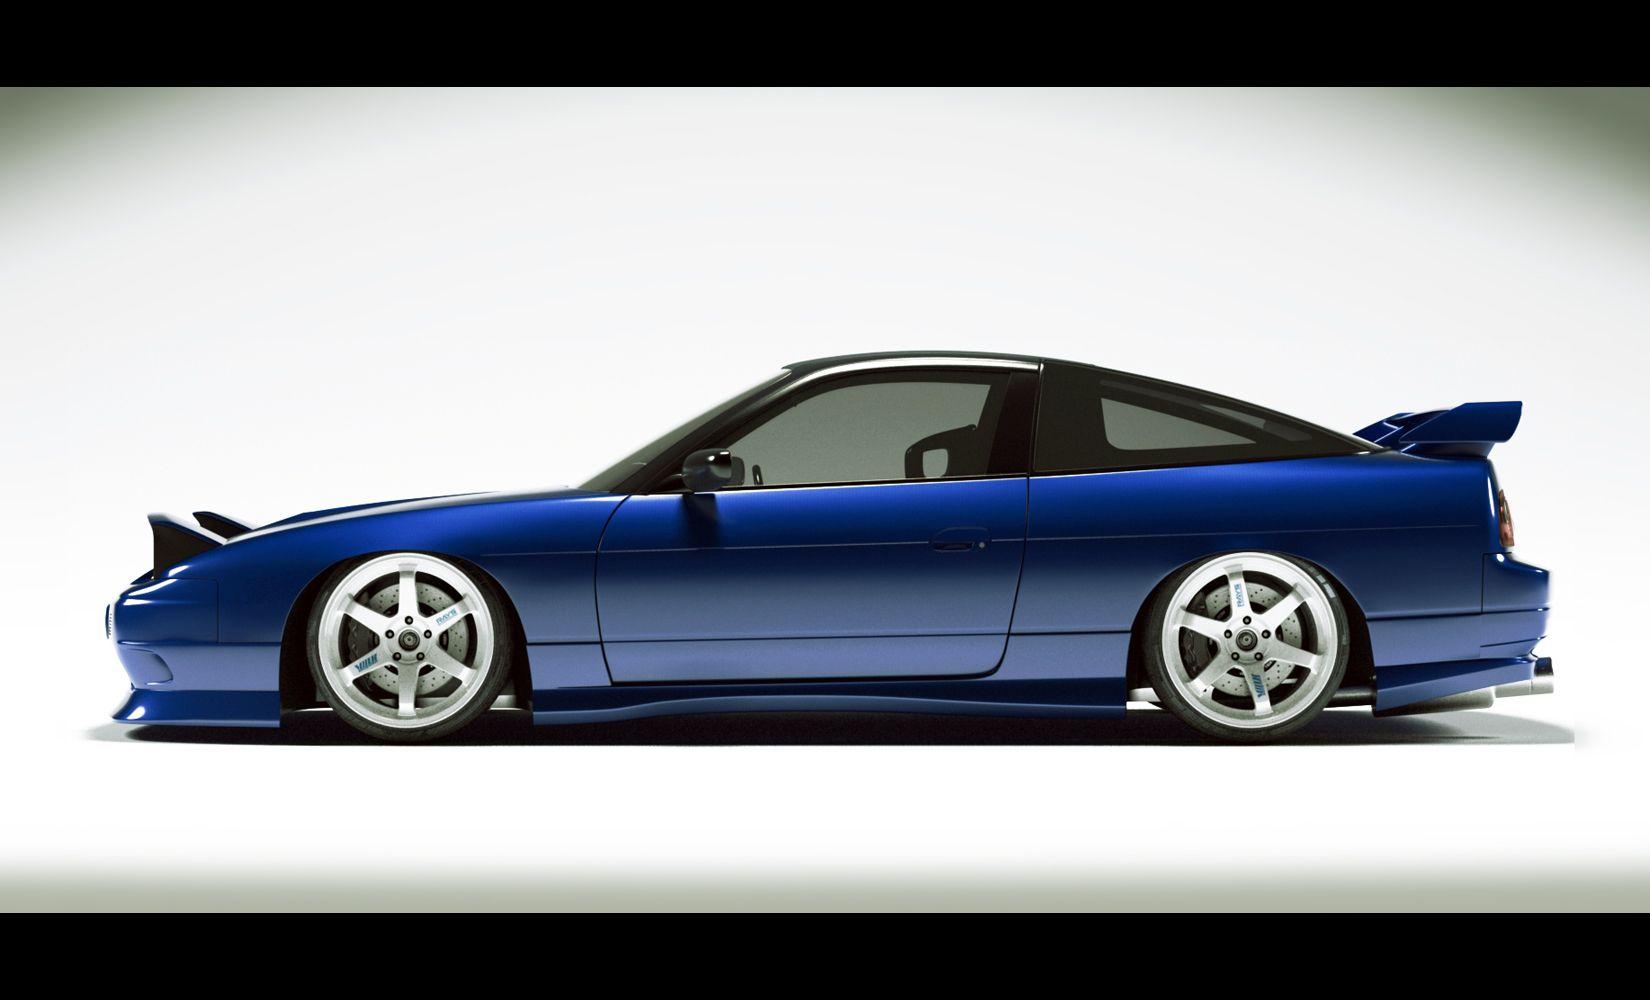 Fix Silvia This Year Nissan Silvia Nissan 180sx Nissan Cars